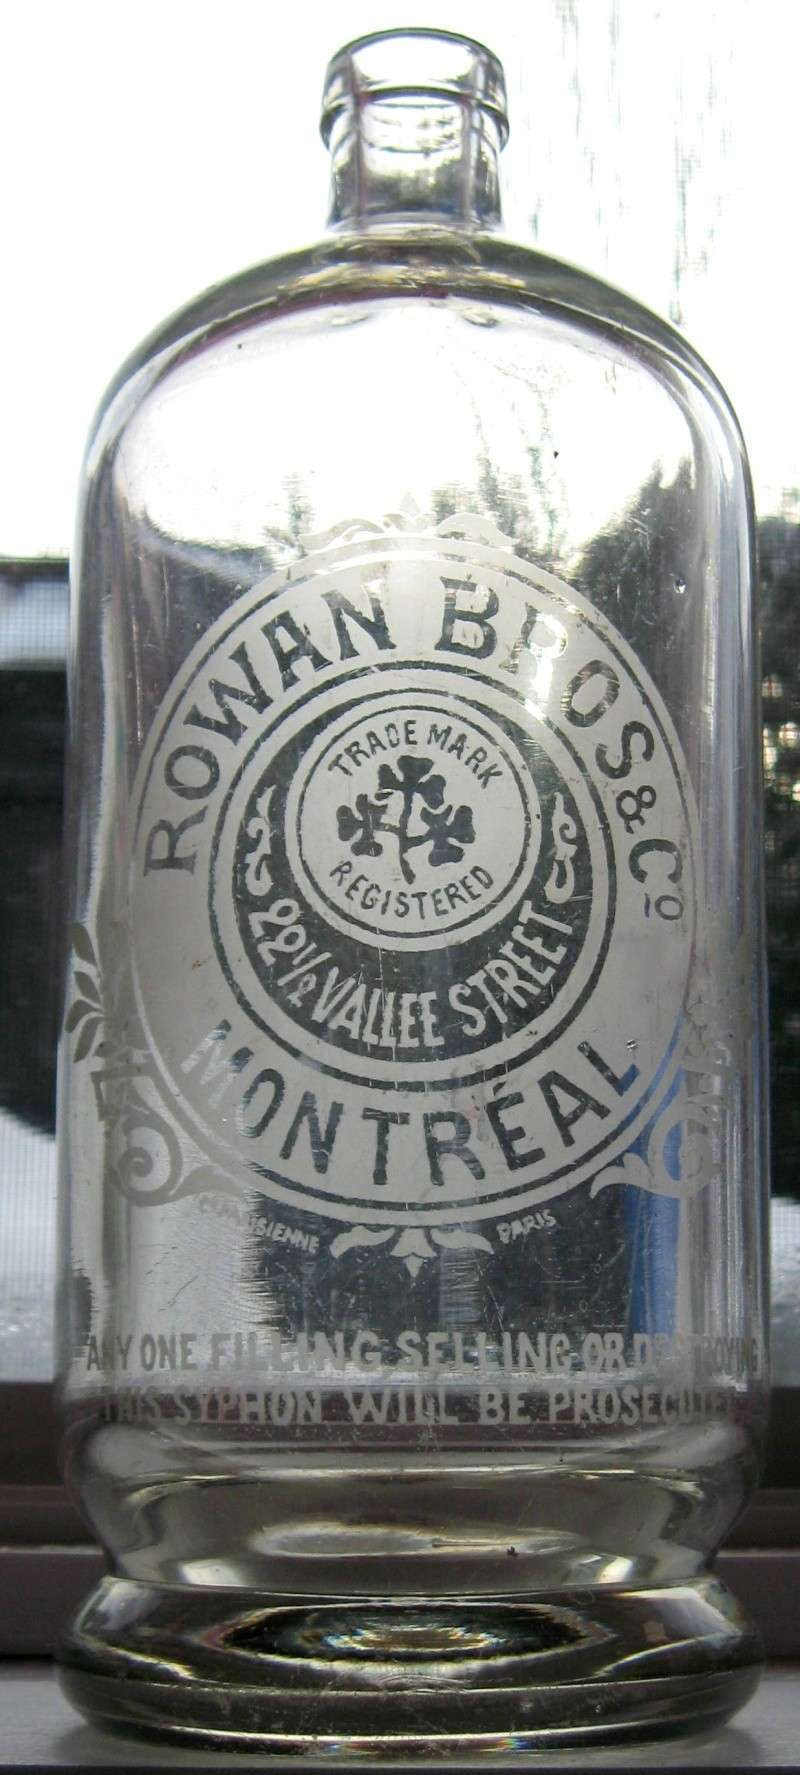 rowan bros & co montreal Rowan_10